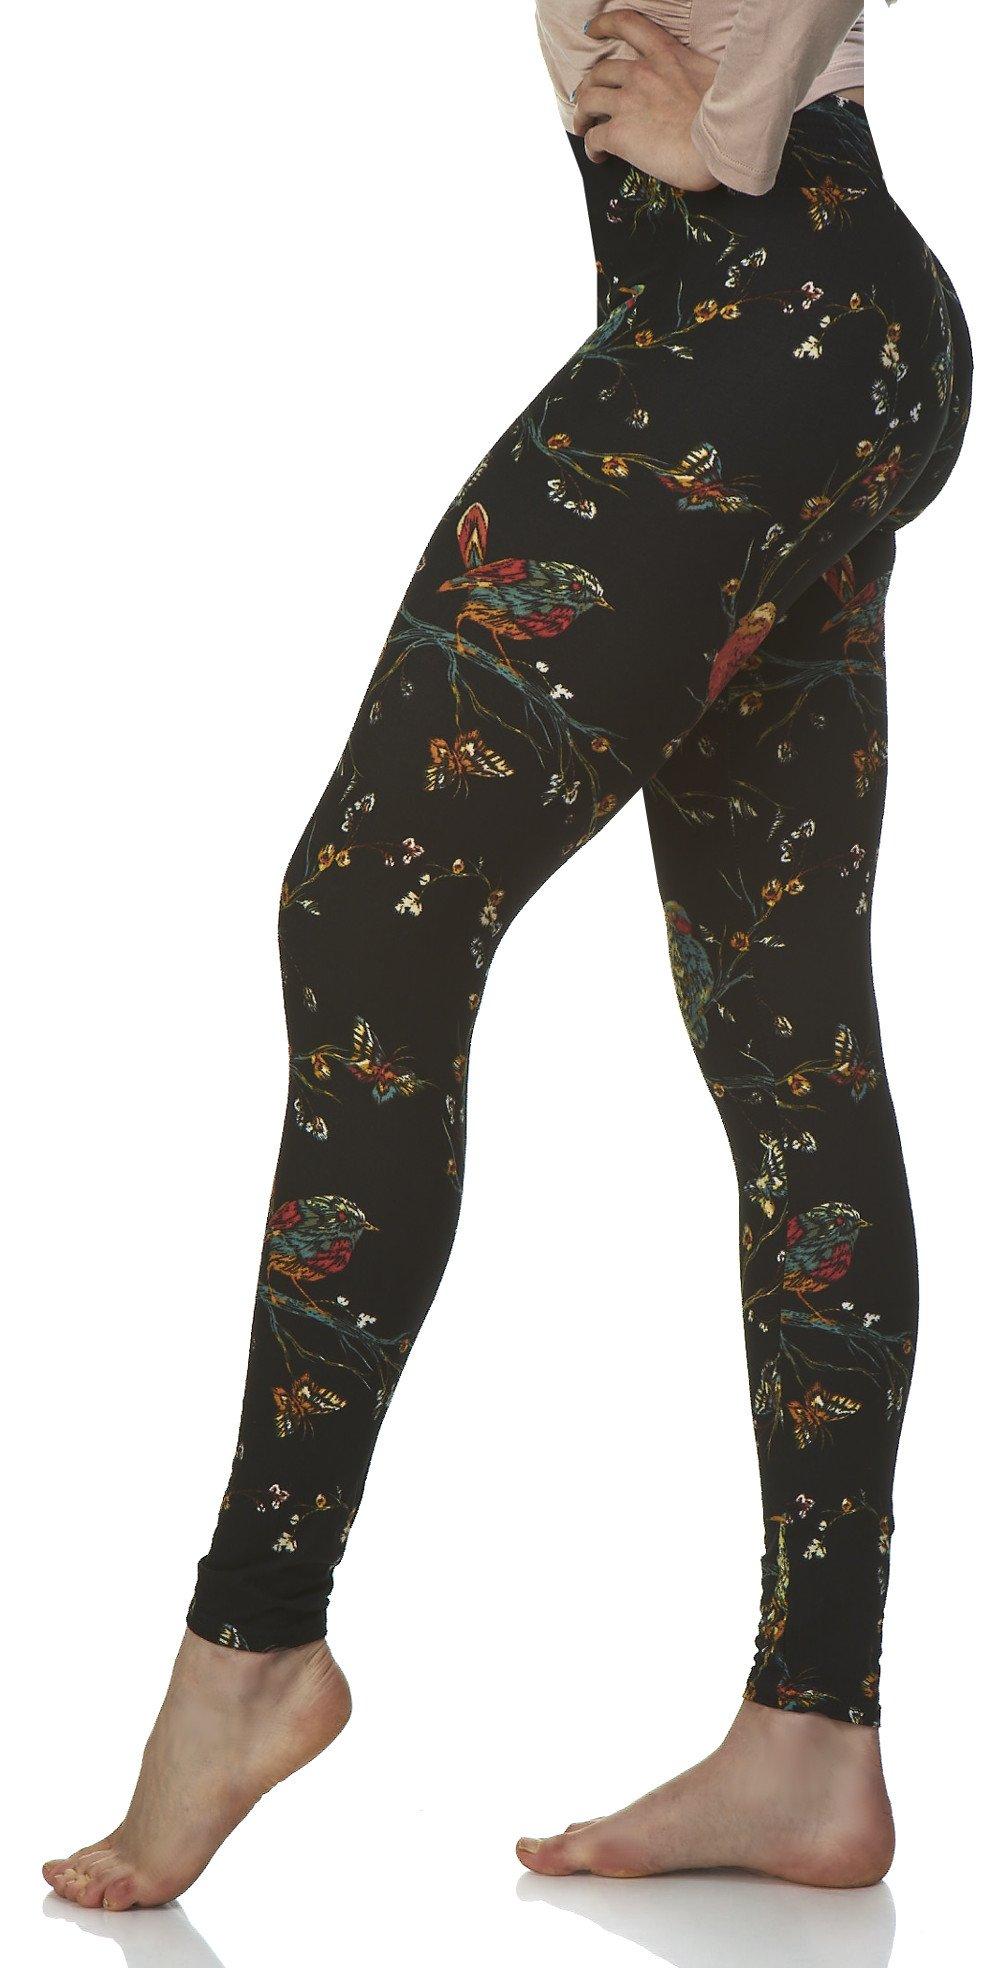 LMB Lush Moda Extra Soft Leggings with Designs- Variety of Prints - 778YF Birds Garden B6